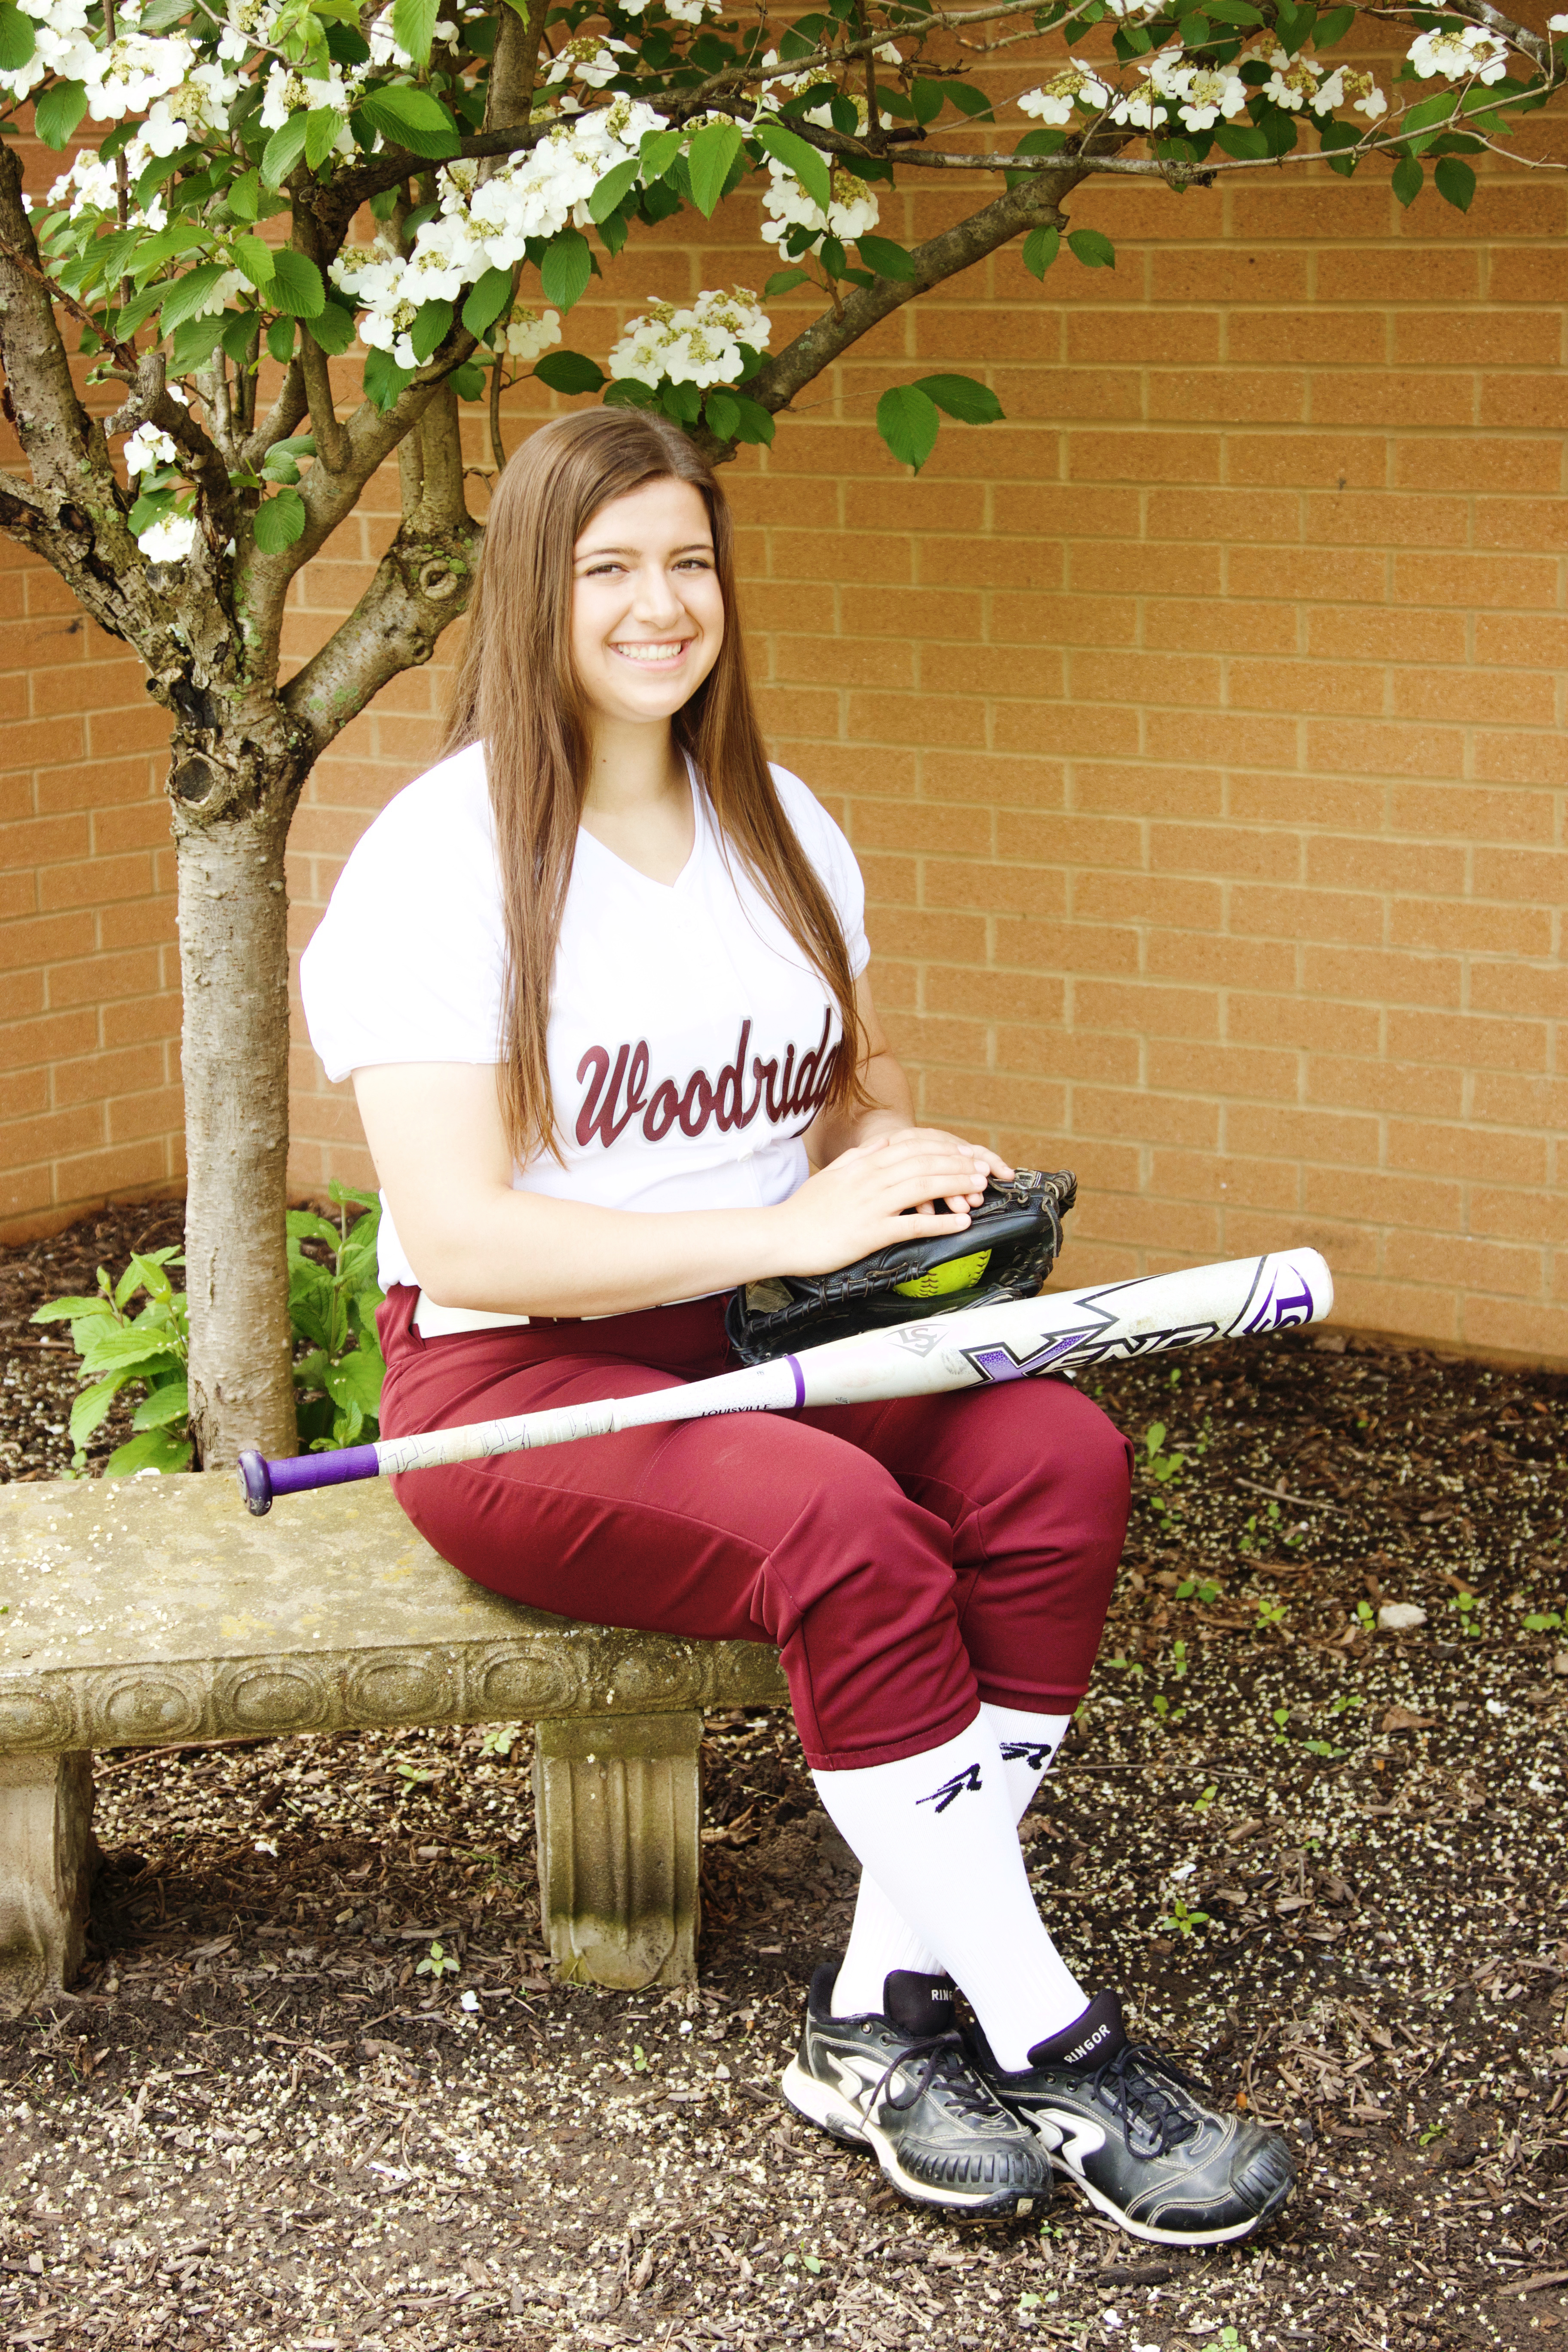 Student Athlete of the Week- Caitlin Raid